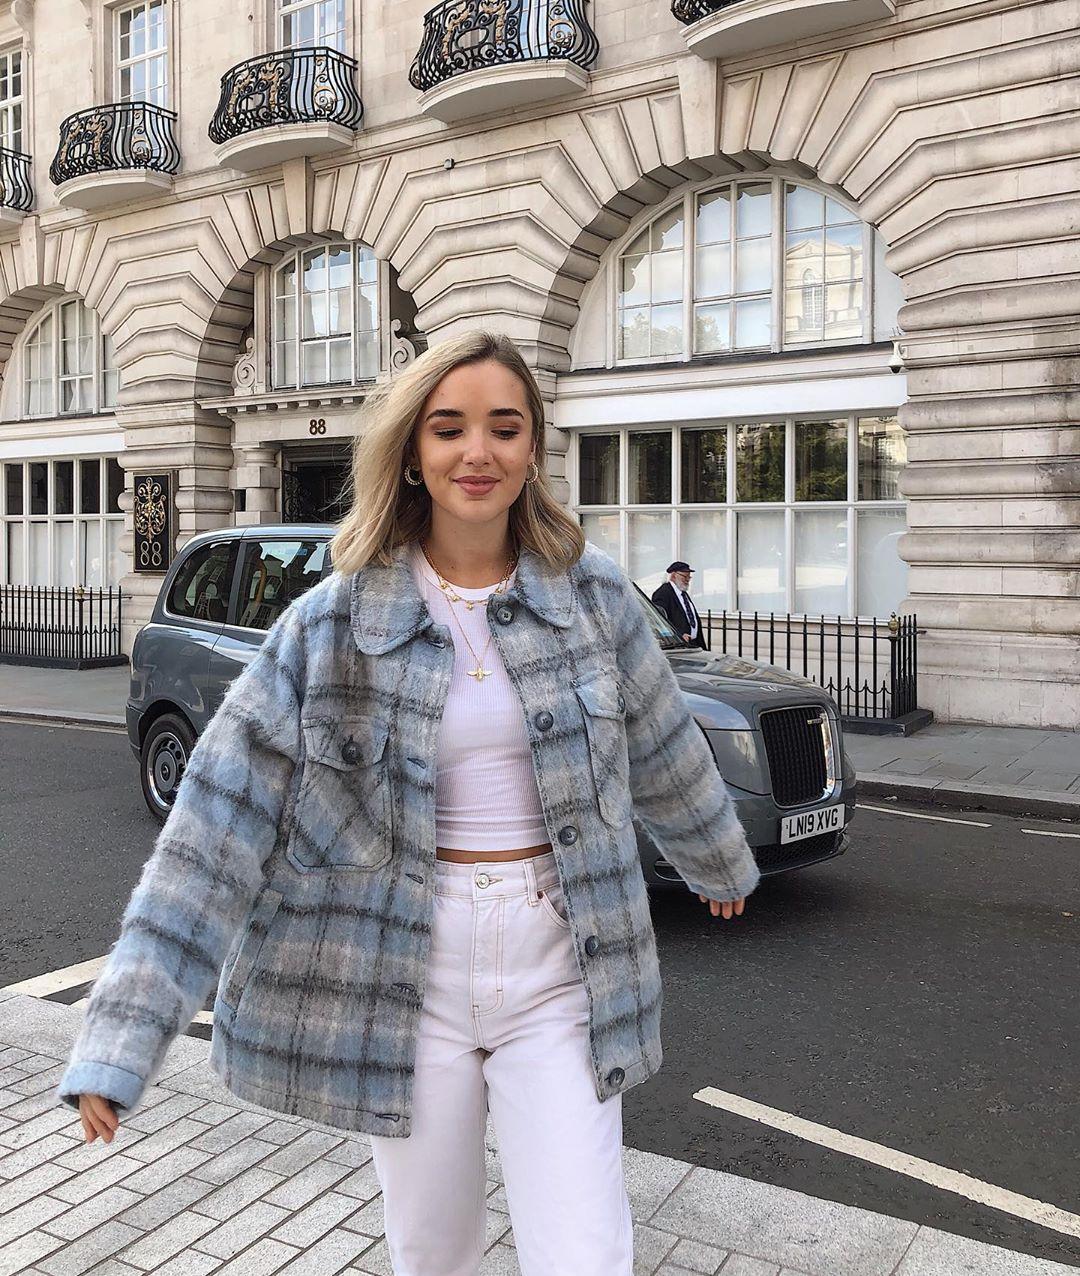 londonblogger